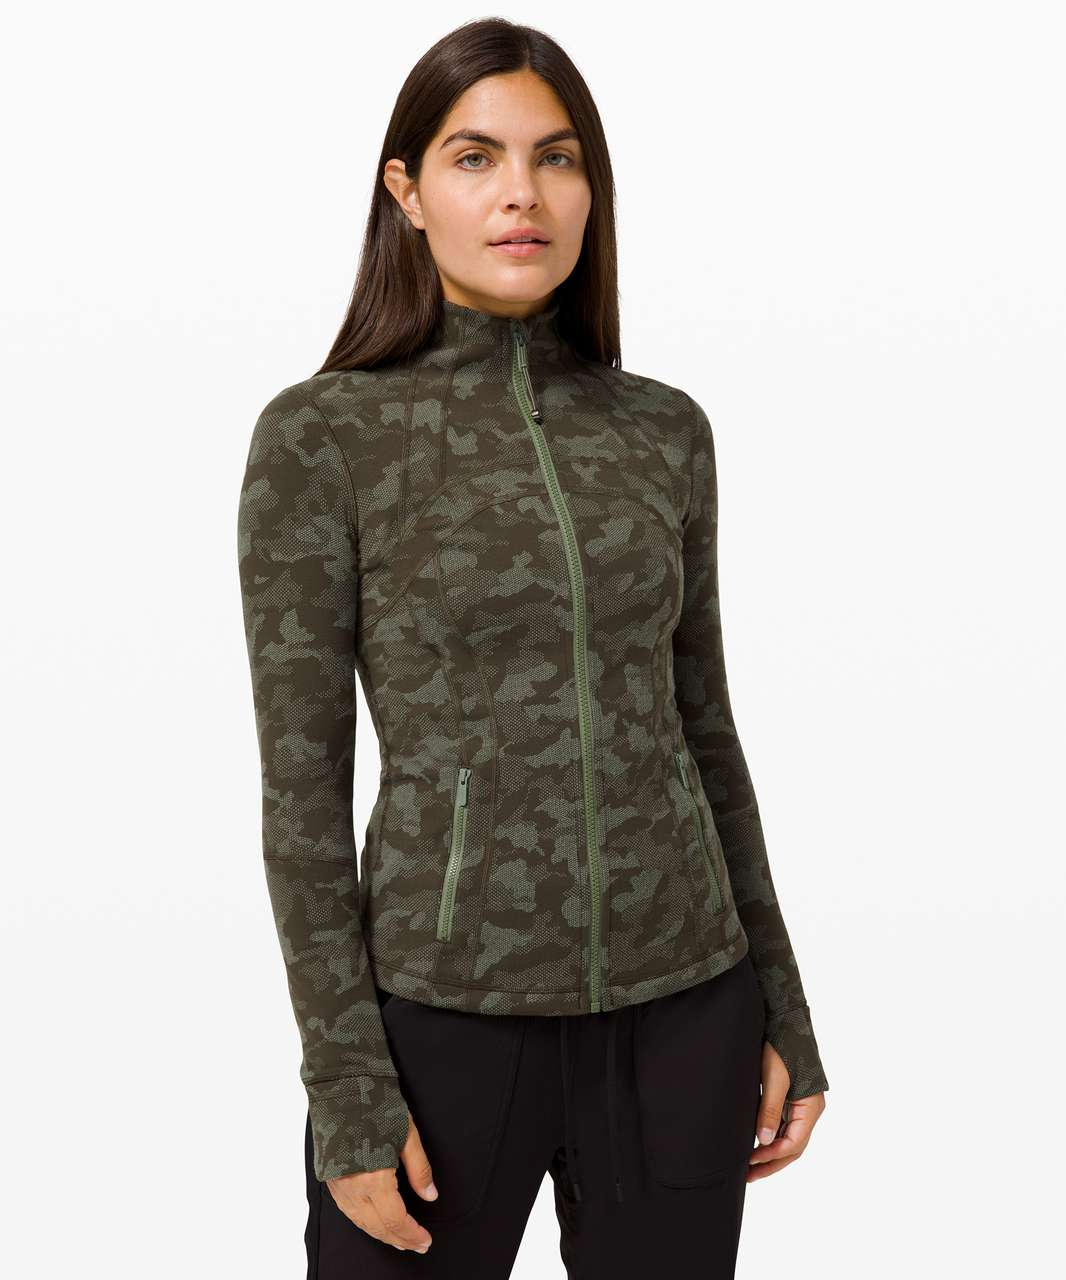 Lululemon Define Jacket - Heritage Camo Dark Olive Green Twill